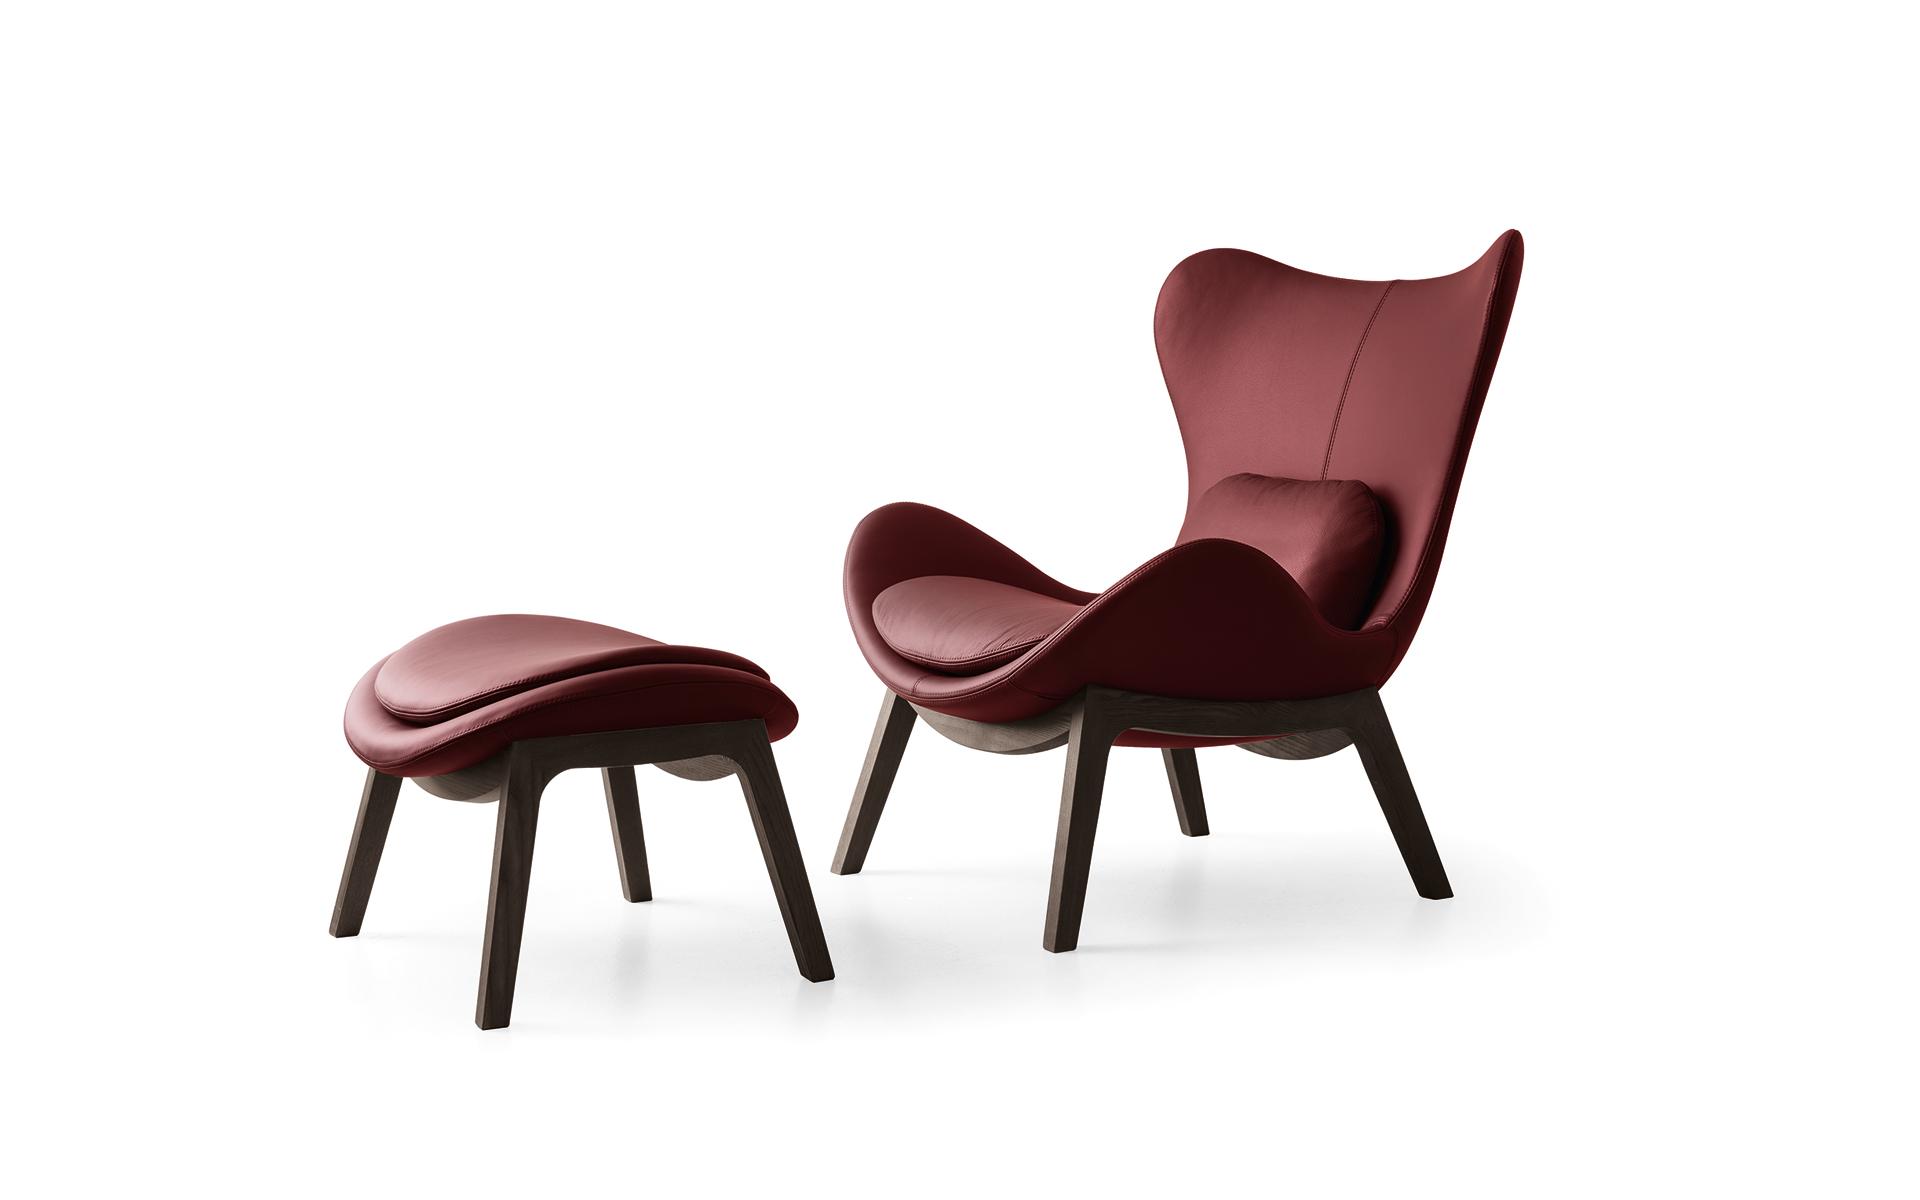 Michele Menescardi Designer Industrial Design Studio